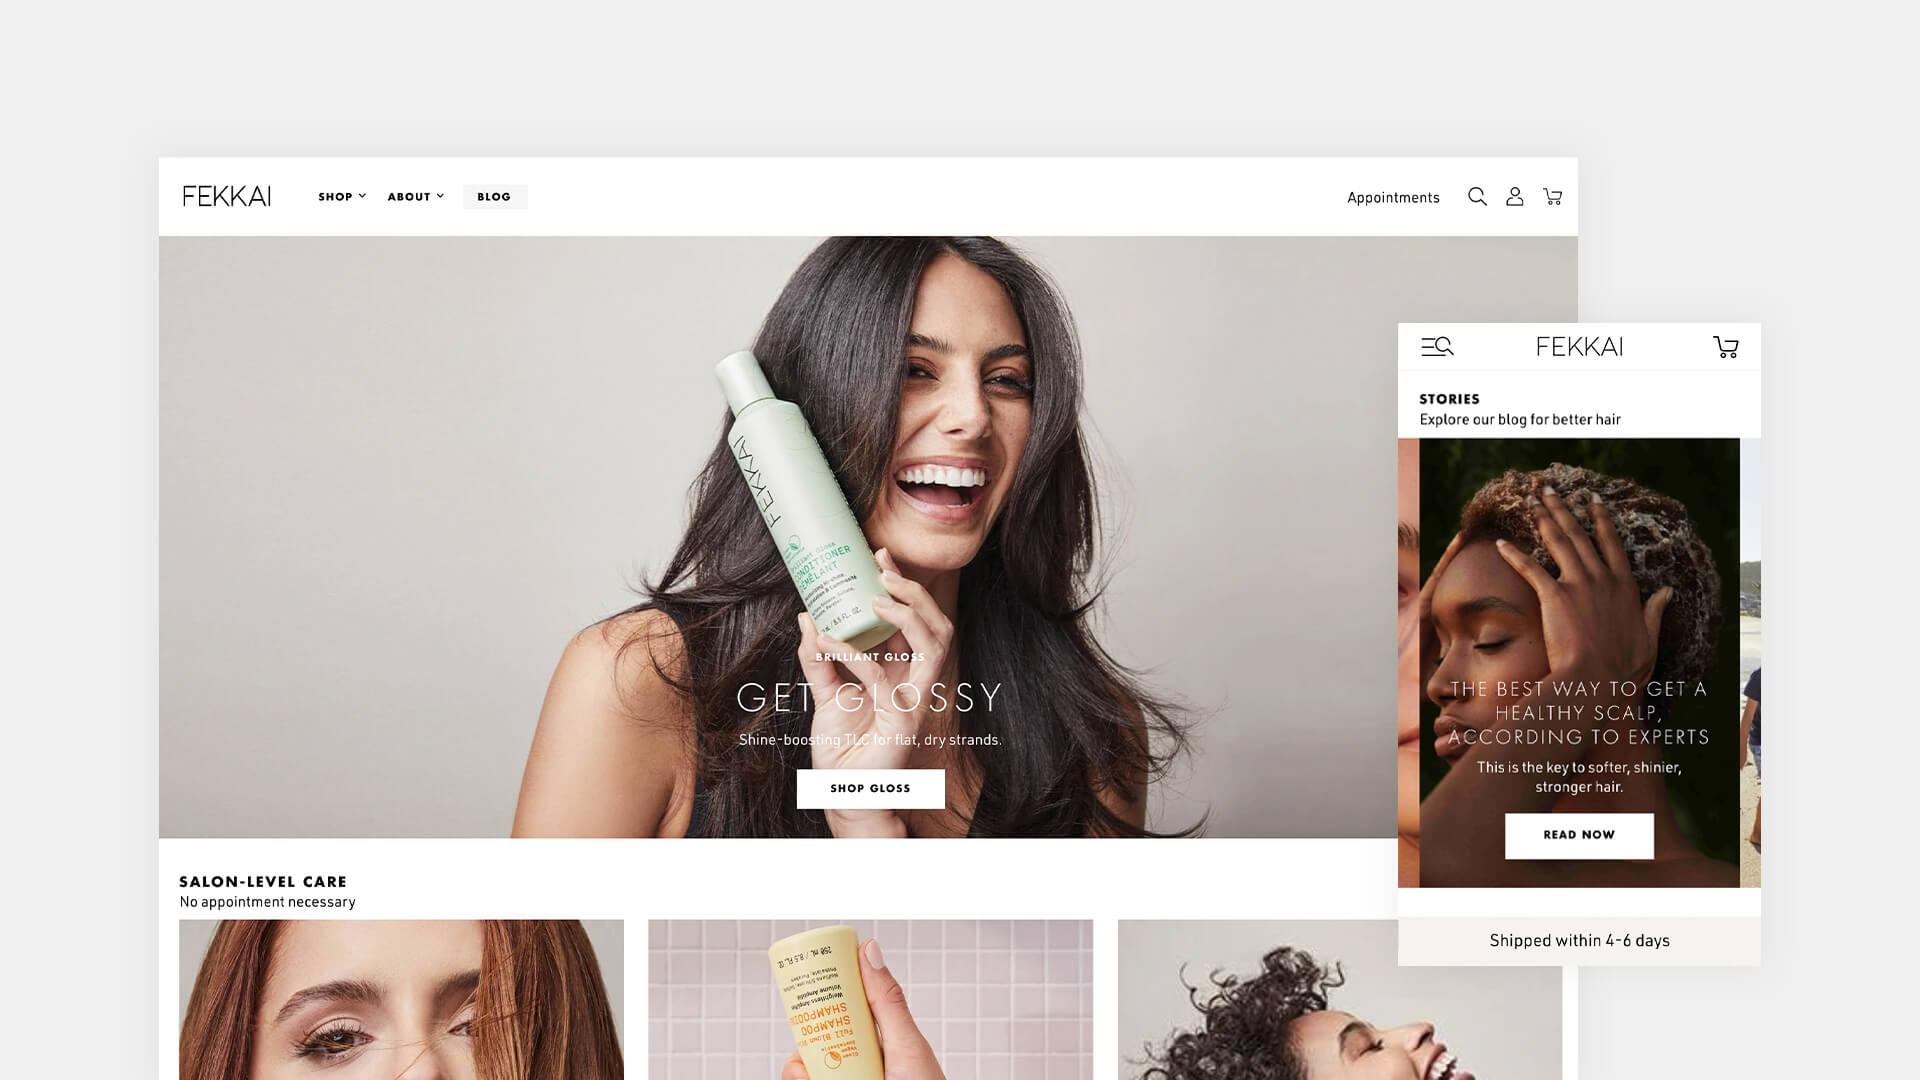 Desktop and mobile homepage